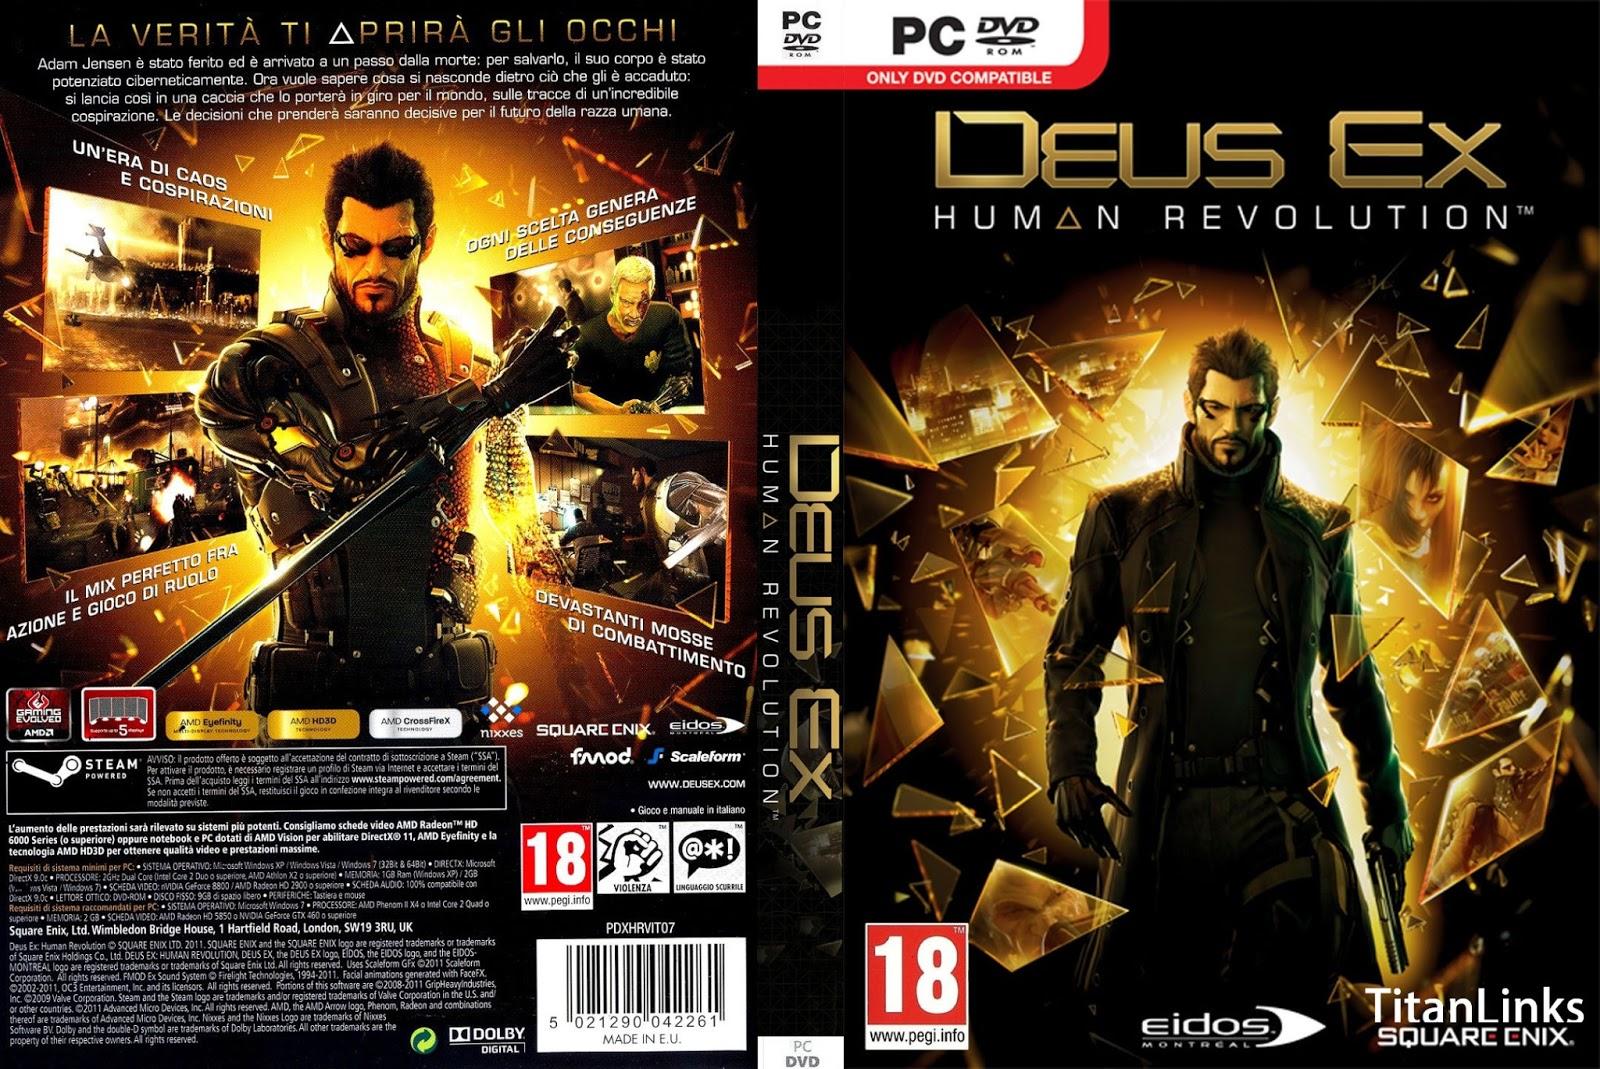 Deus ex human revolution pc crack download.